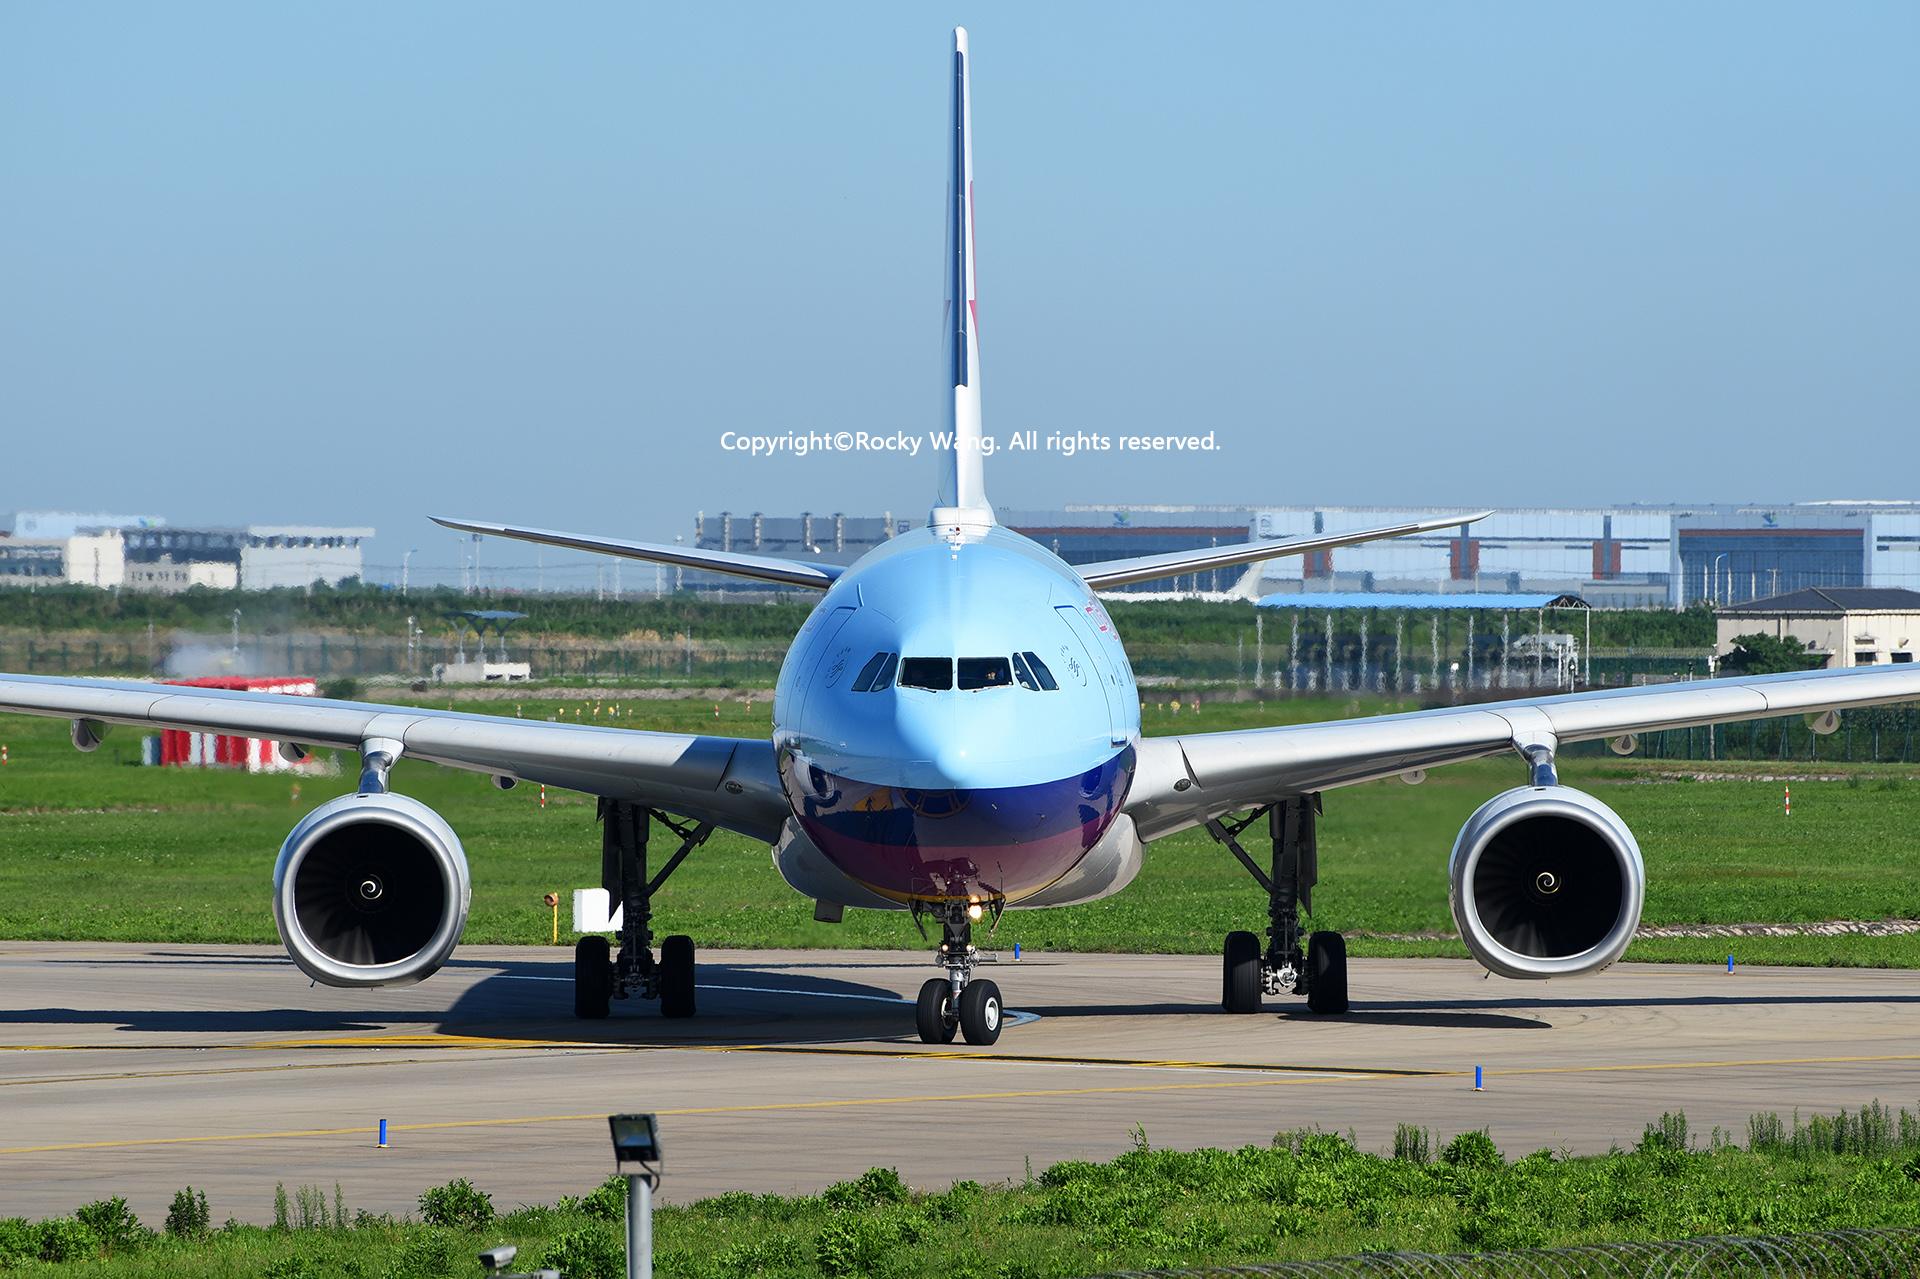 [原创]盗图就别狂 发组表情自己体会 AIRBUS A330-243 B-5943 Shanghai Pudong